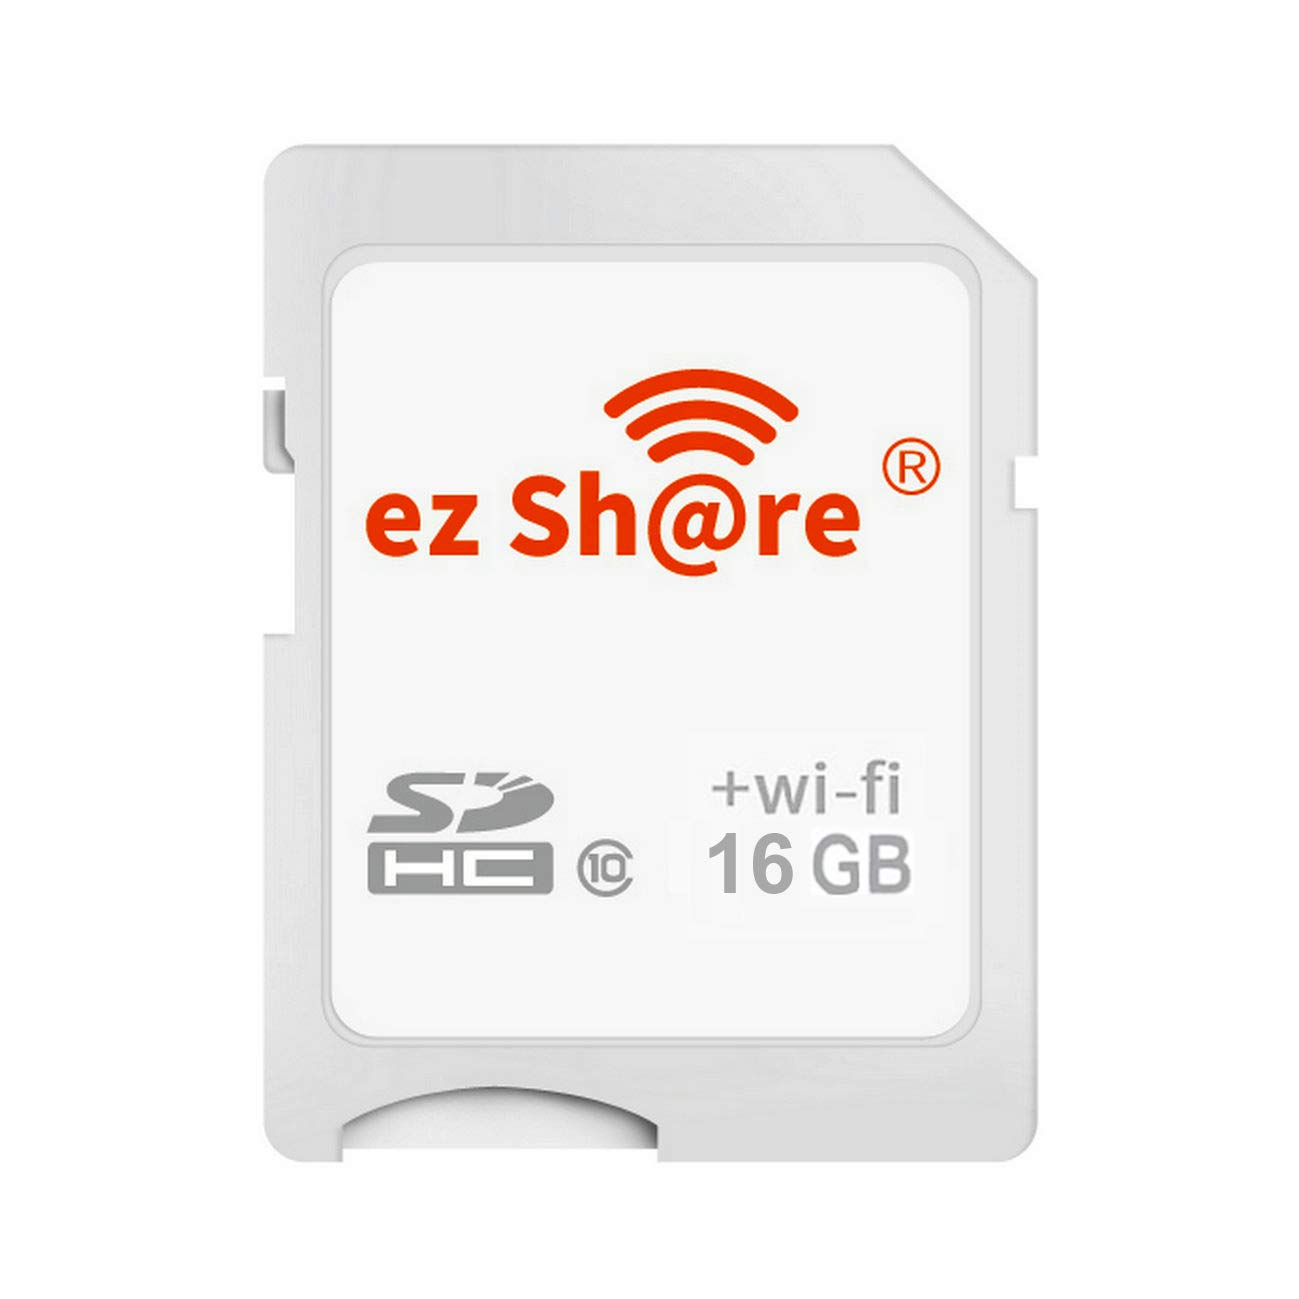 GuDoQi Wireless WiFi SD Tarjeta 16GB SHDC Clase 10 Tarjeta De Memoria Flash para Canon Nikon Casio Cámara Digital SLR (Versión Mejorada)